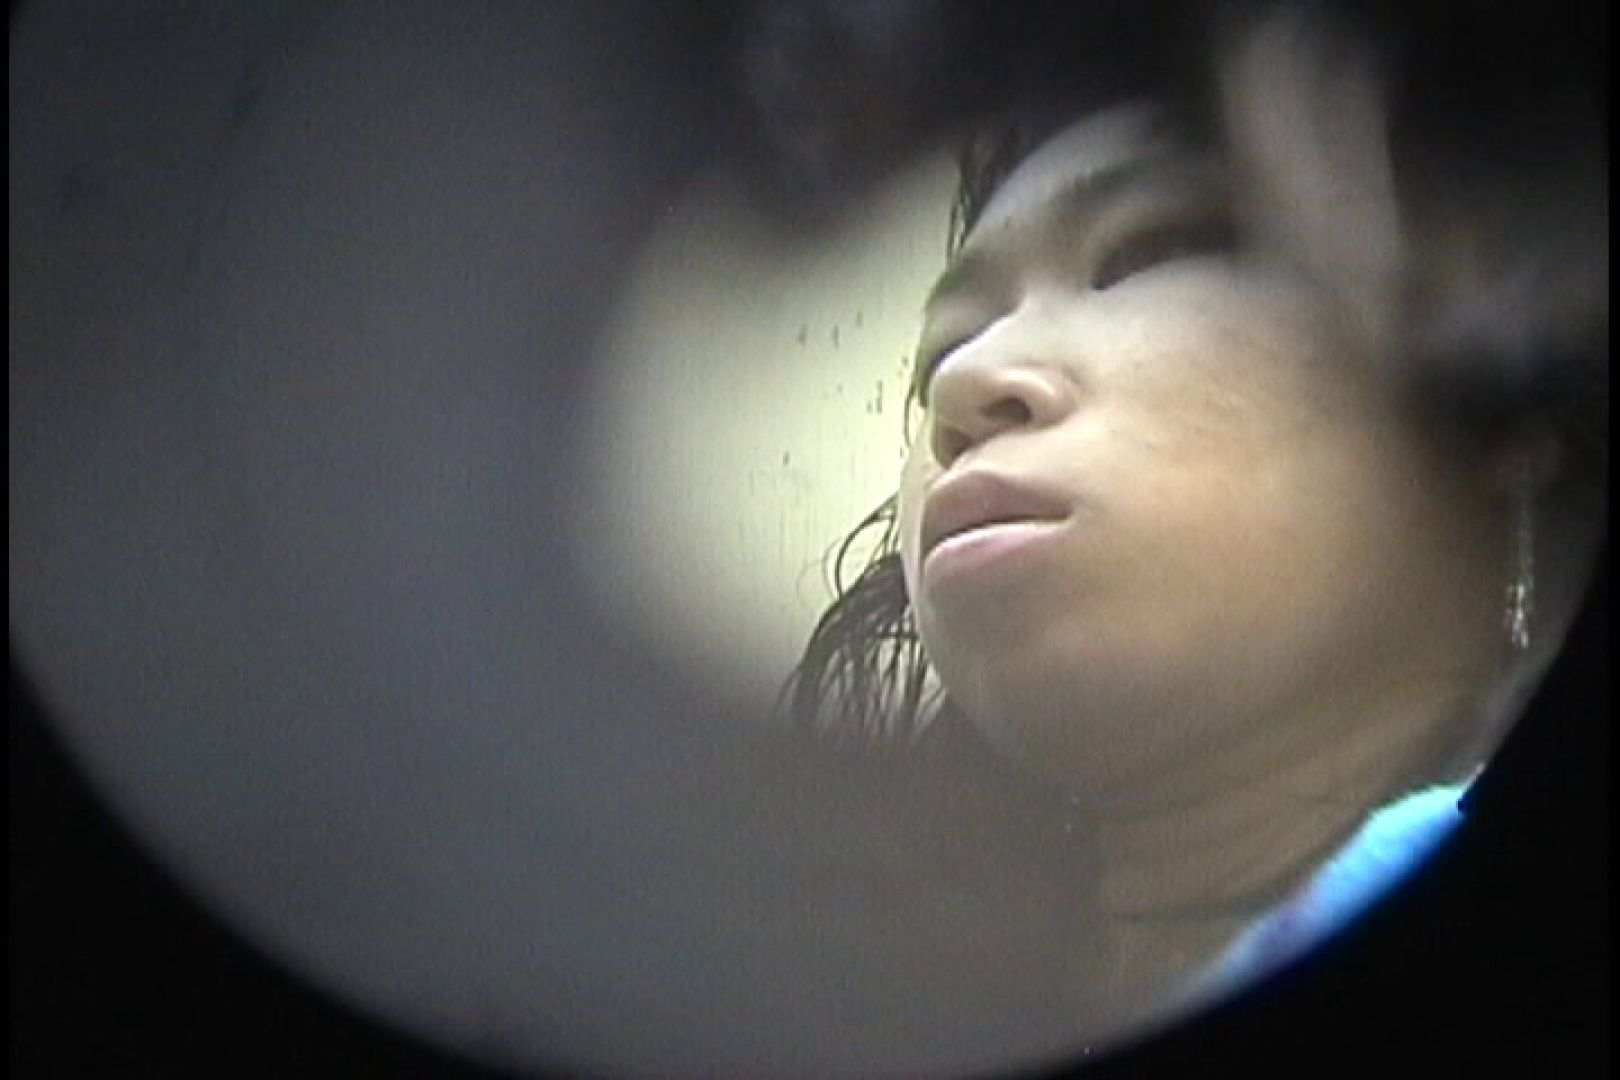 No.29 ウル技炸裂!!すべて見えてます!! シャワー室 オメコ動画キャプチャ 76画像 75